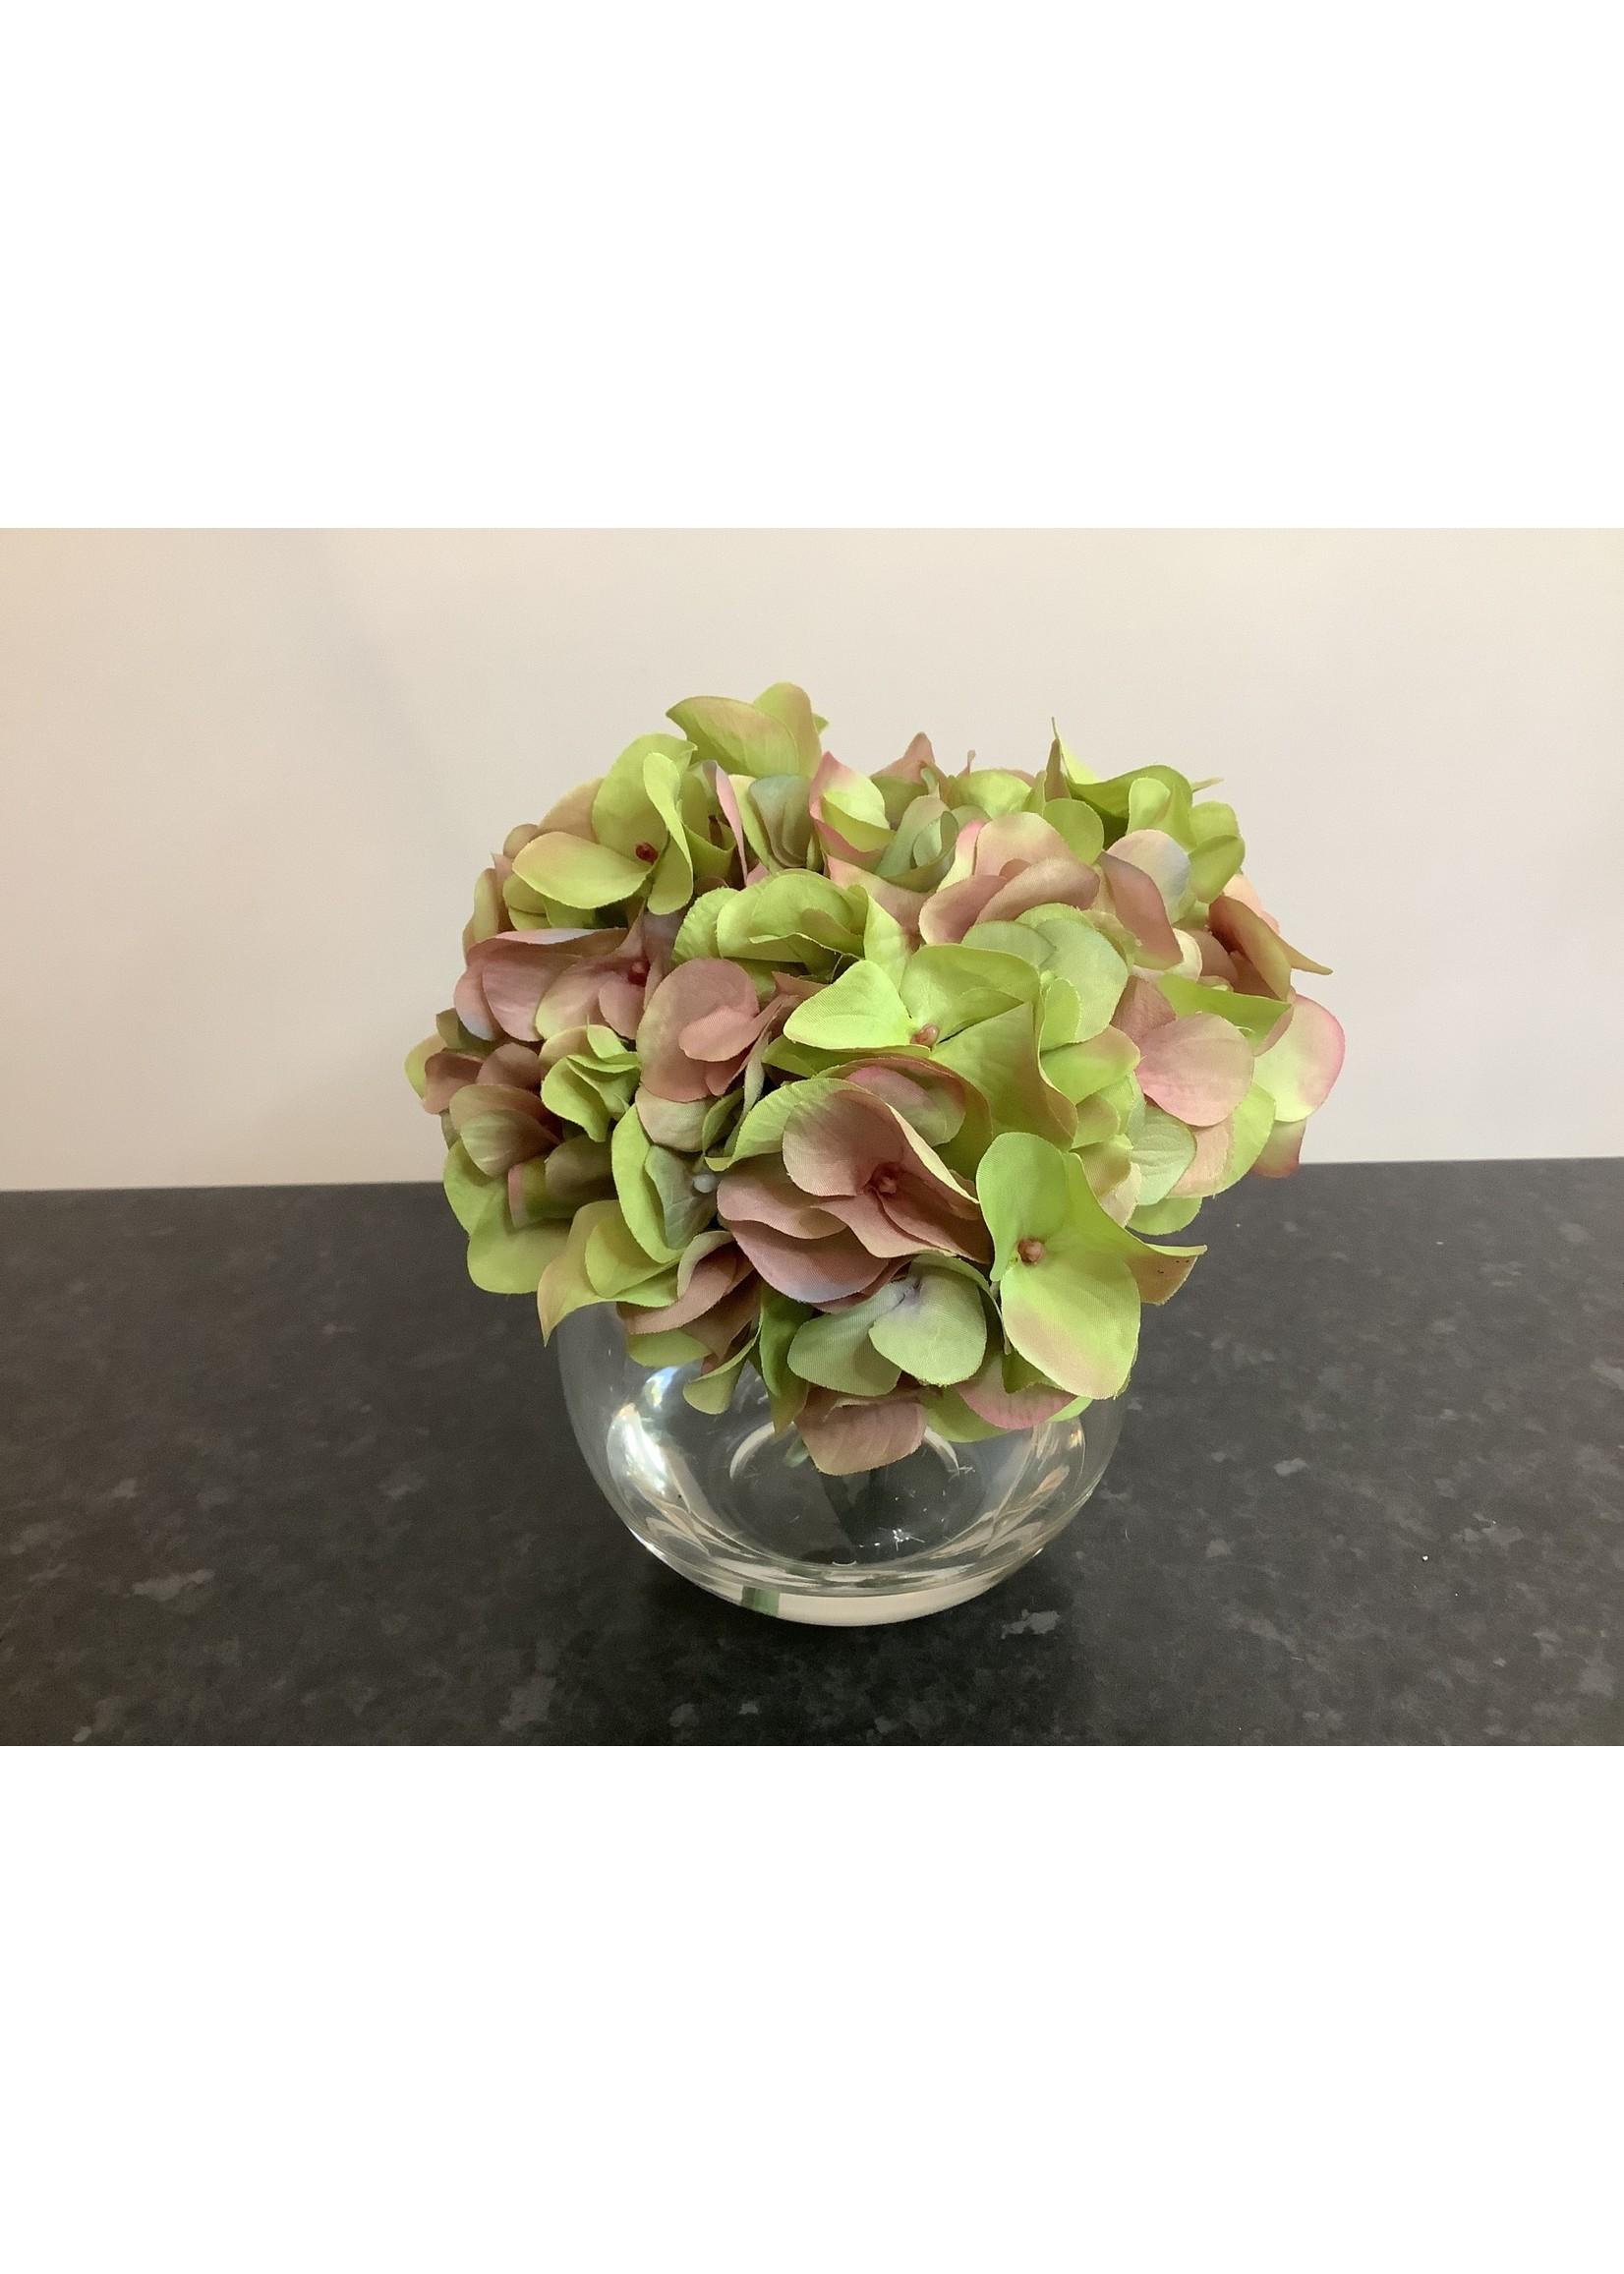 Hydrangea in glass vase 16x24cm